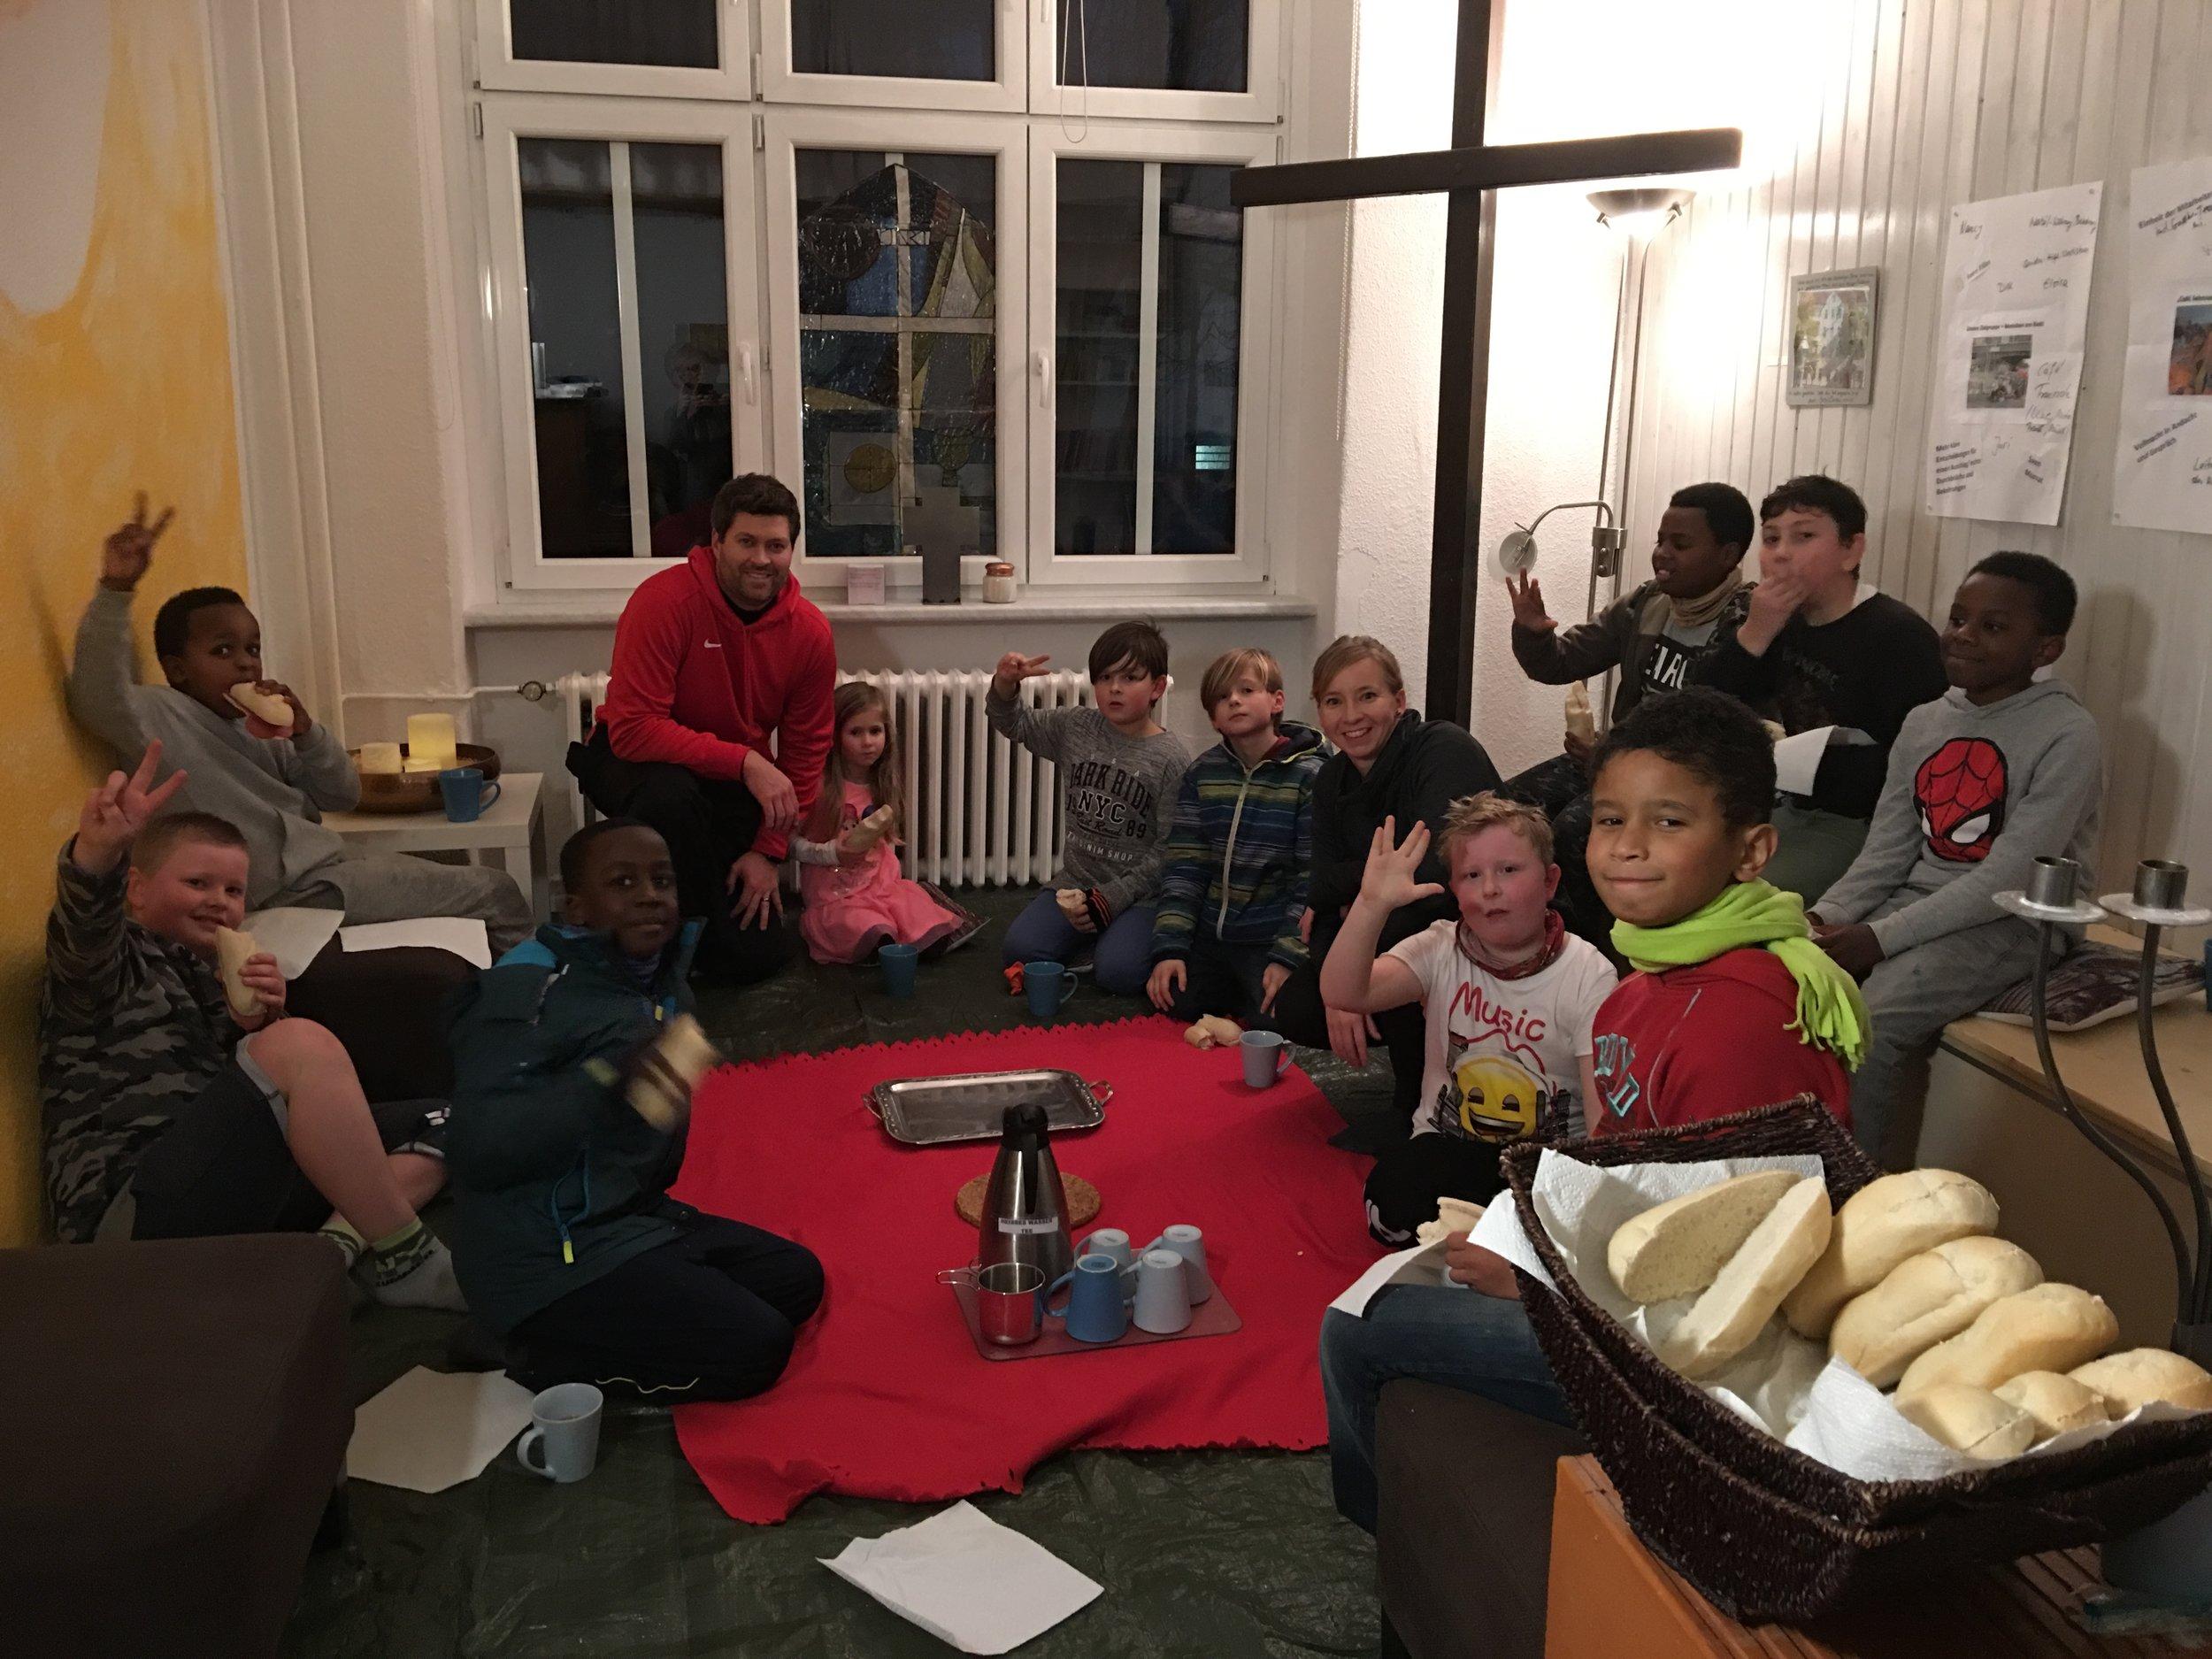 Celebrating Christmas in Reinickendorf